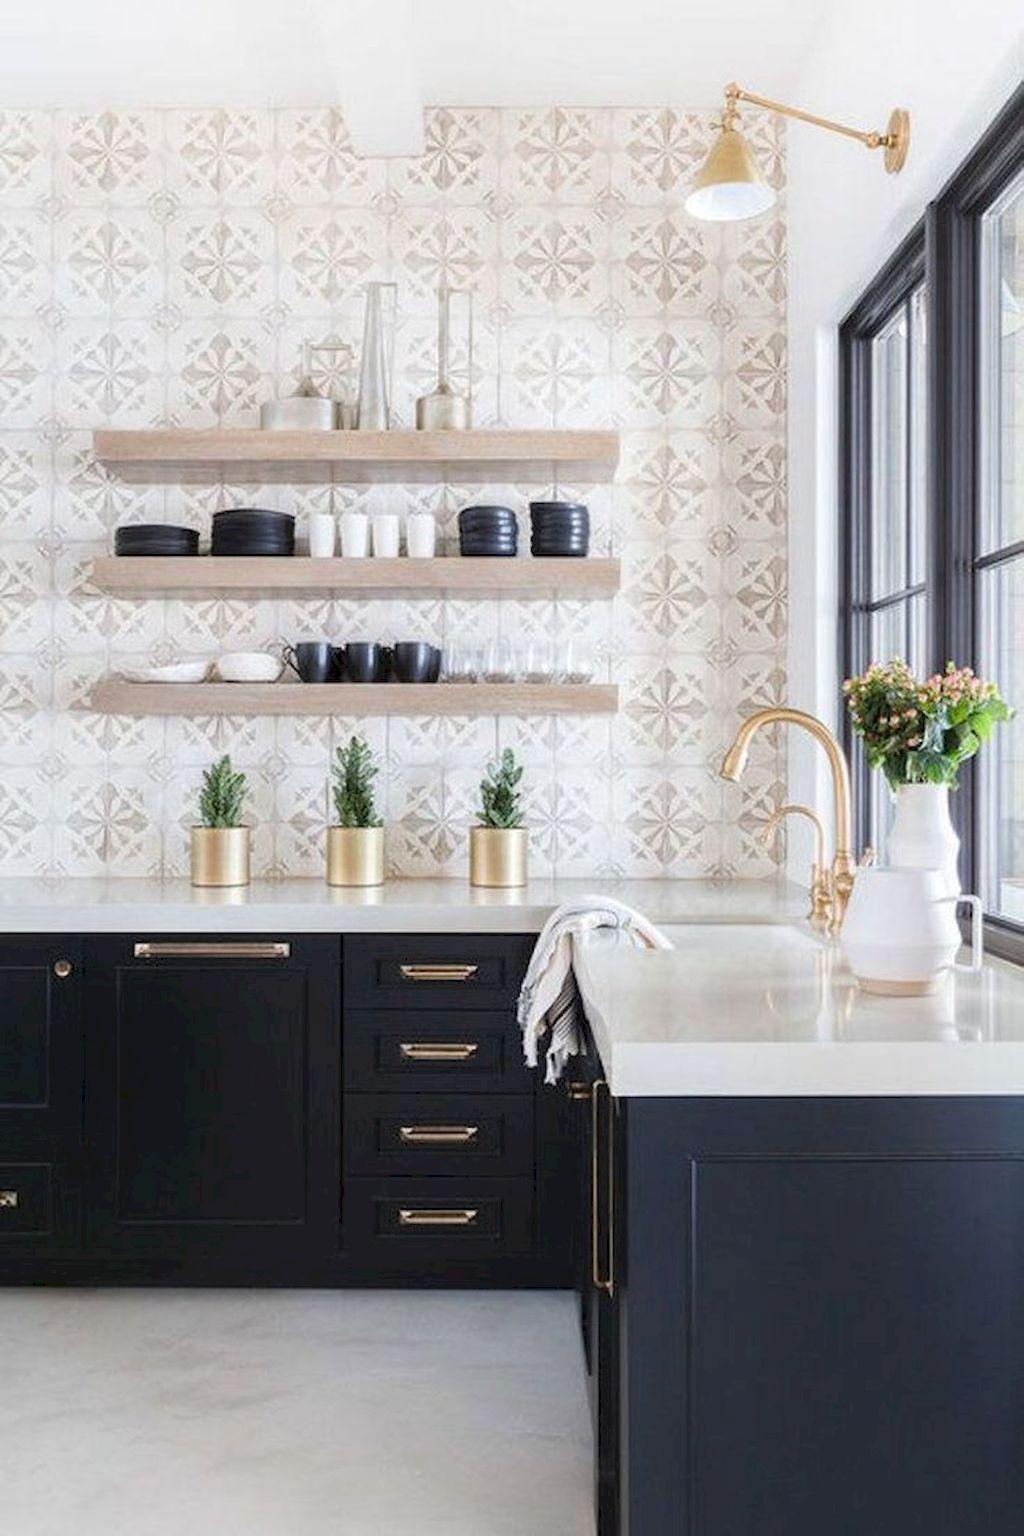 Kitchen Backsplash Ideas In 2019 In 2019 Modern Farmhouse